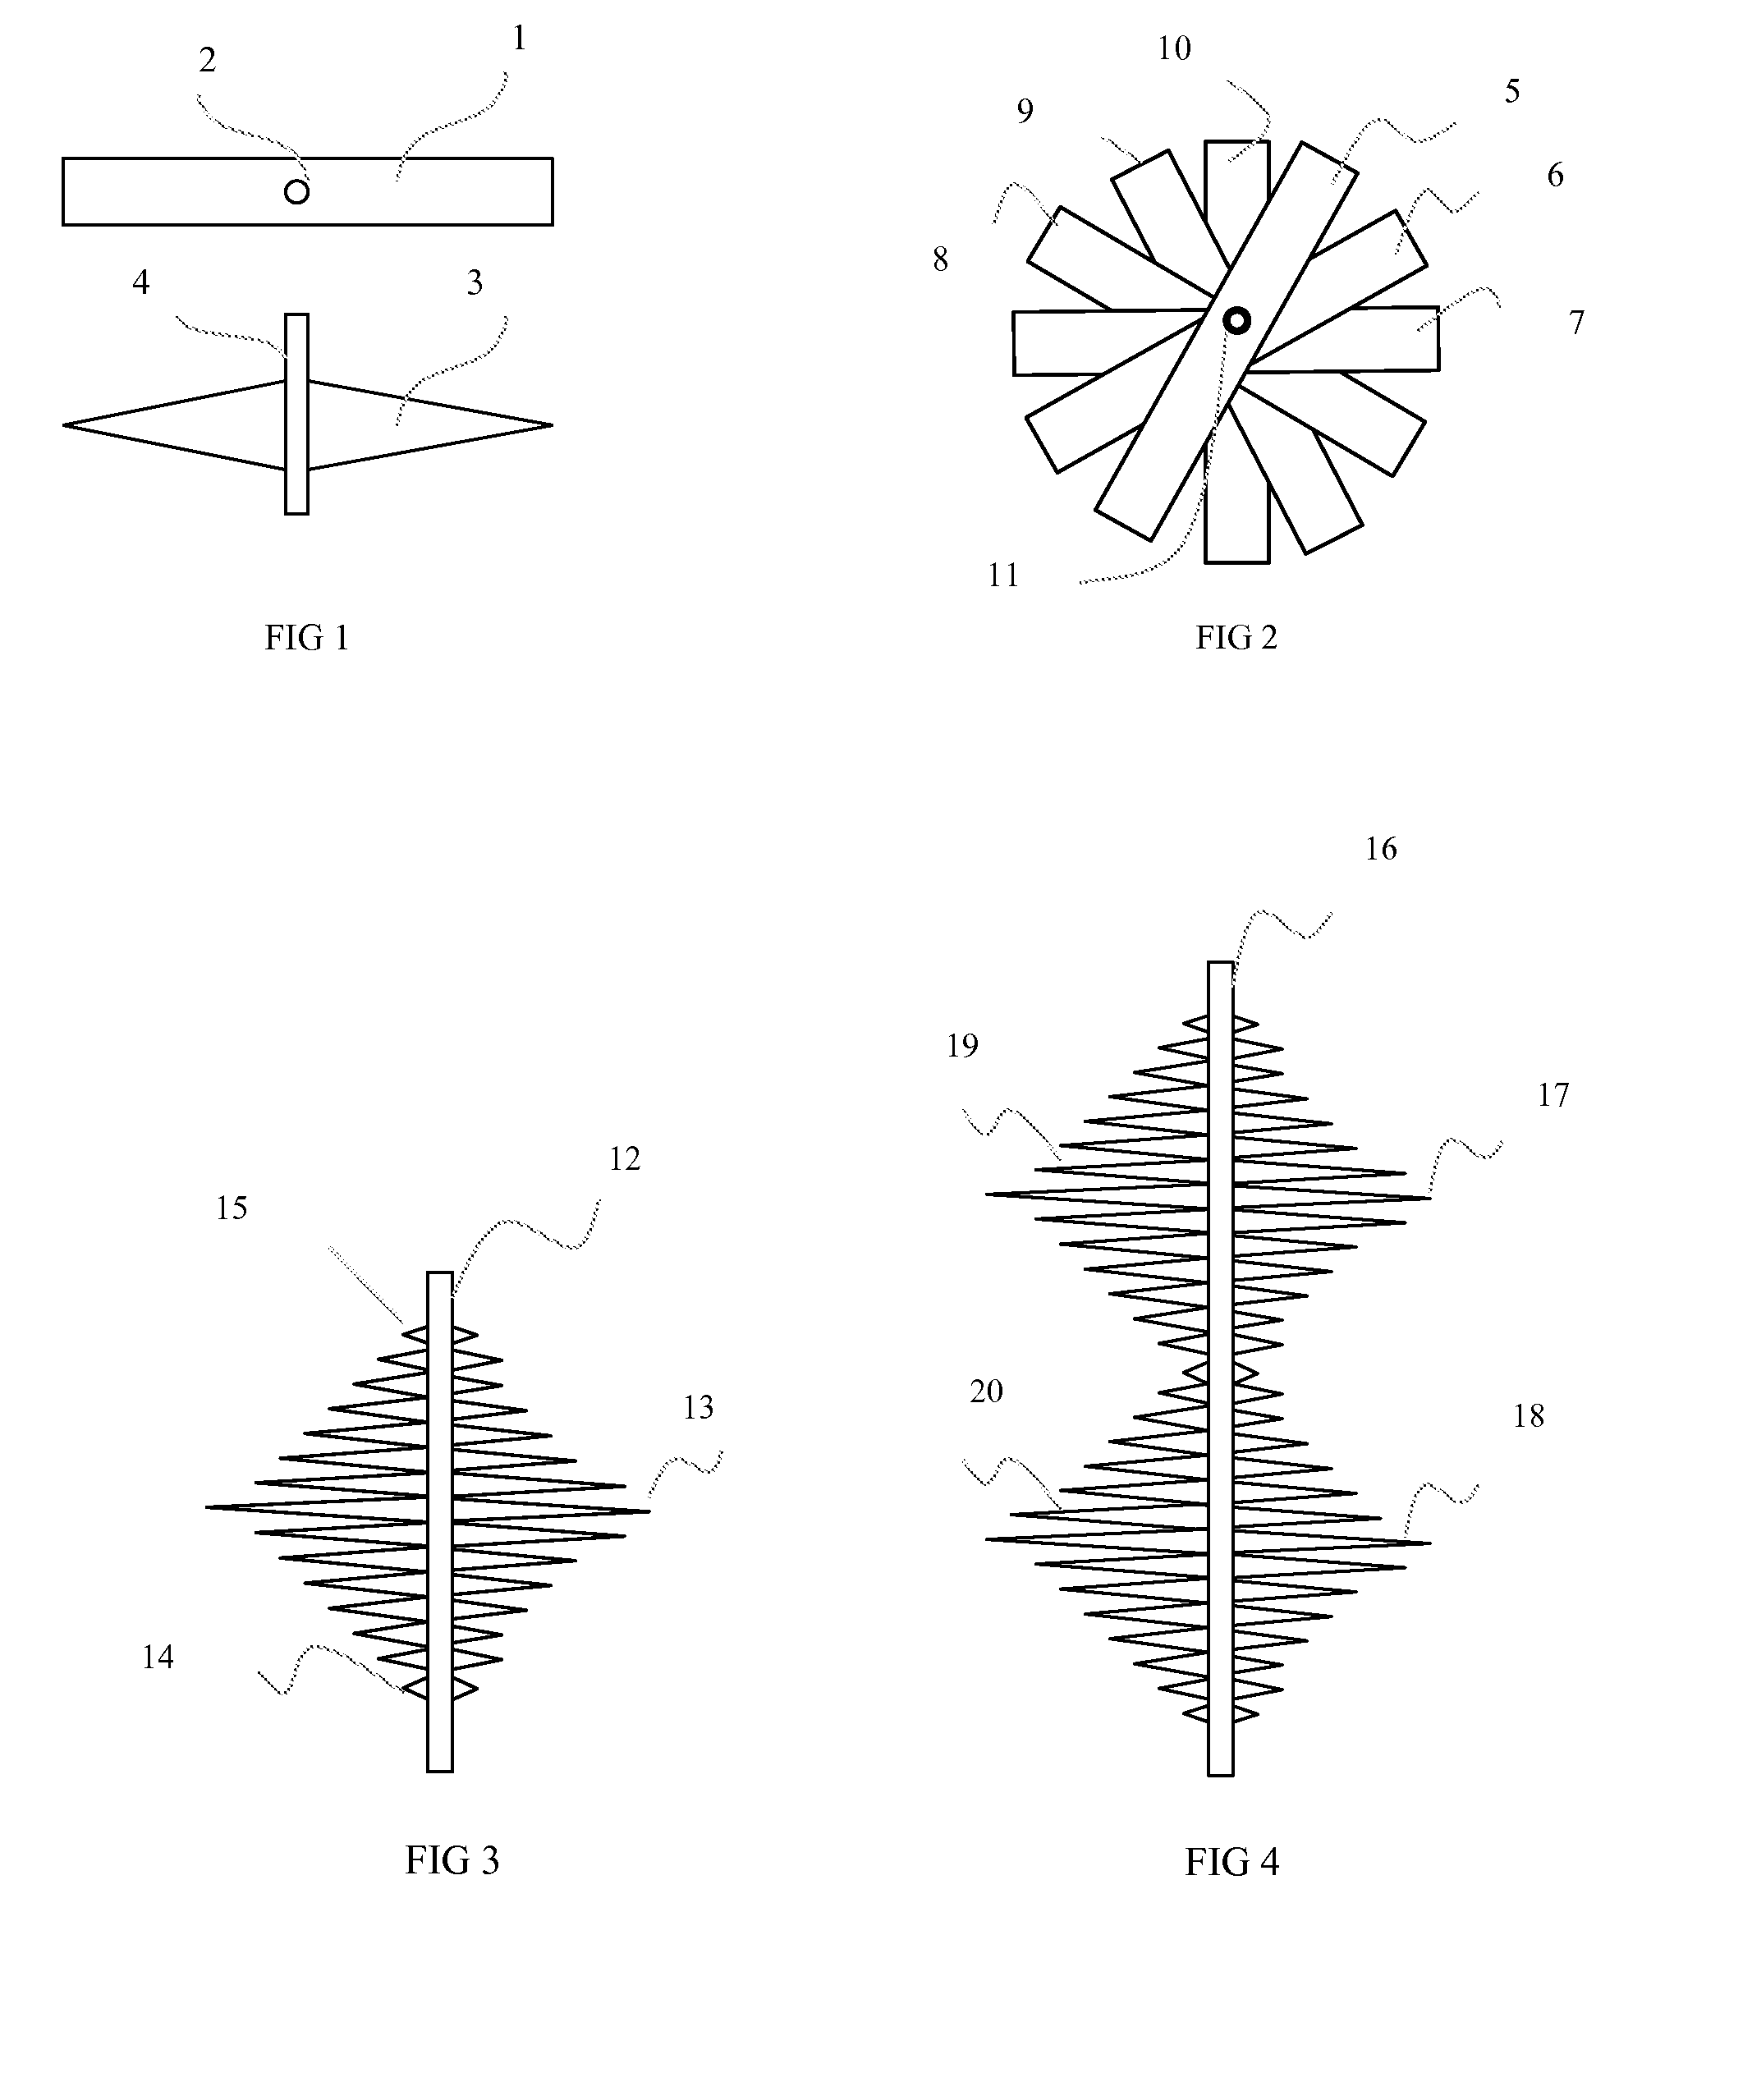 Wind Generator Wiring Diagrams 2003 ford explorer fuse panel